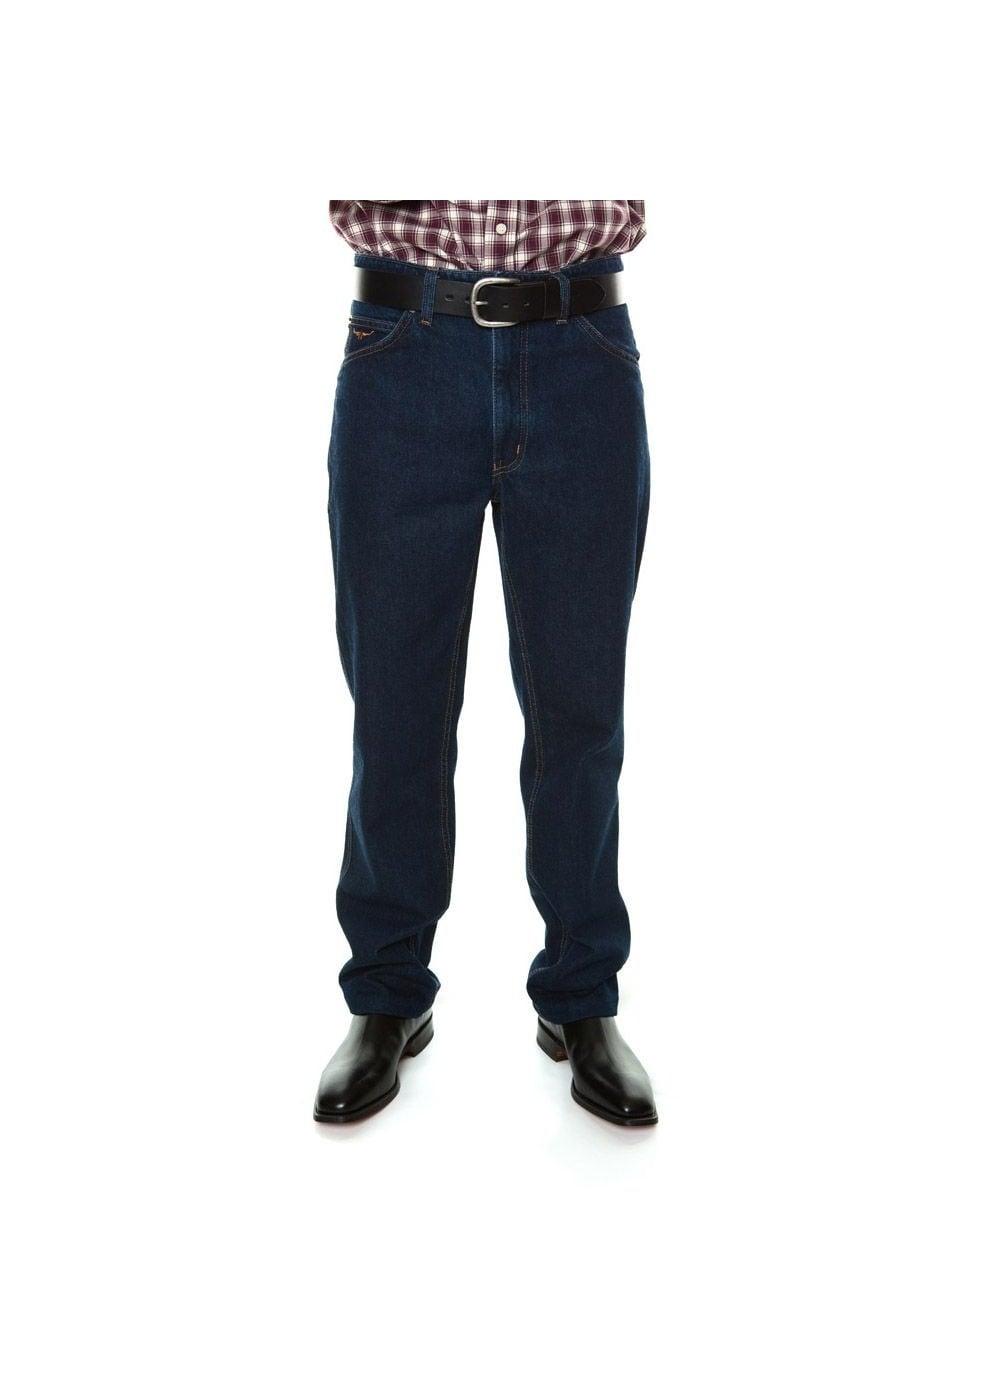 RM Williams Legends Regular Fit Boot